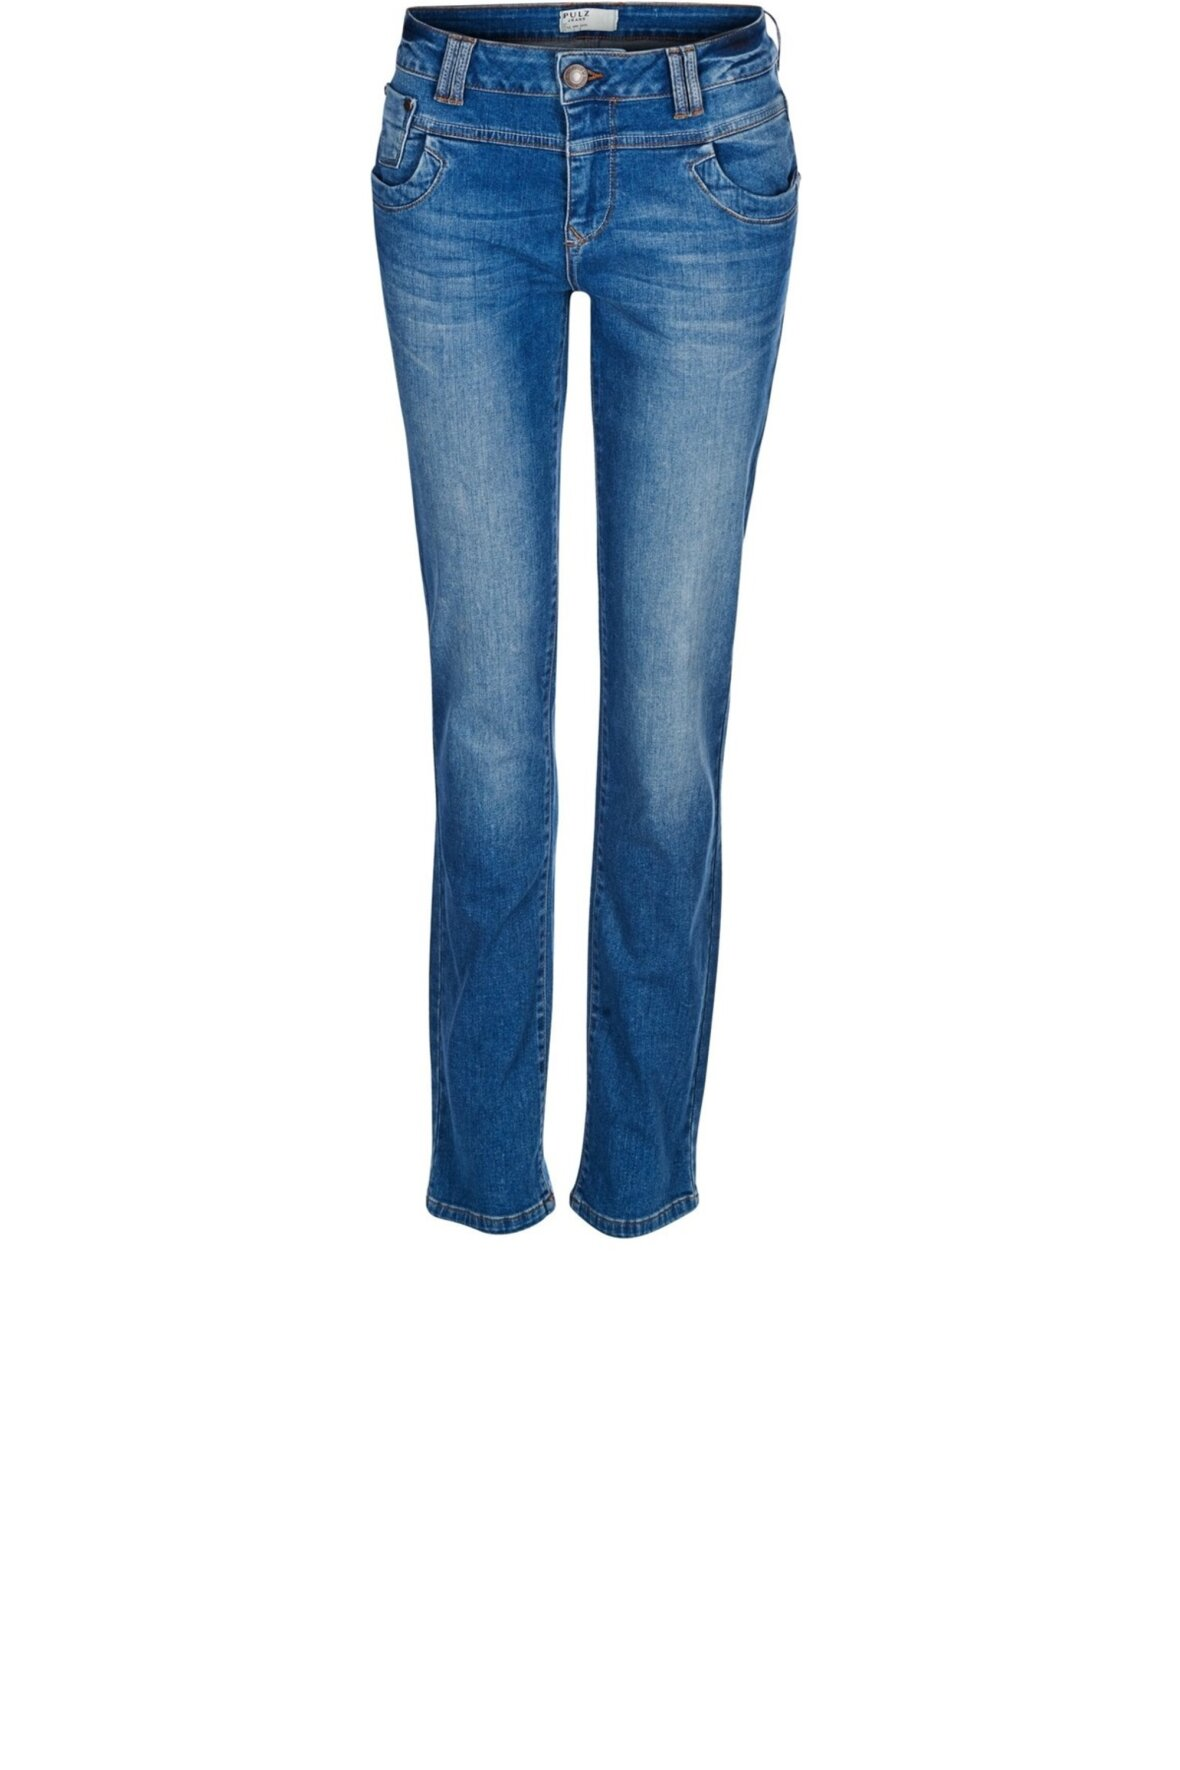 ed711d3b063 Pulz Tenna Highwaist Jeans, buks, 50201802 - Hos Lohse